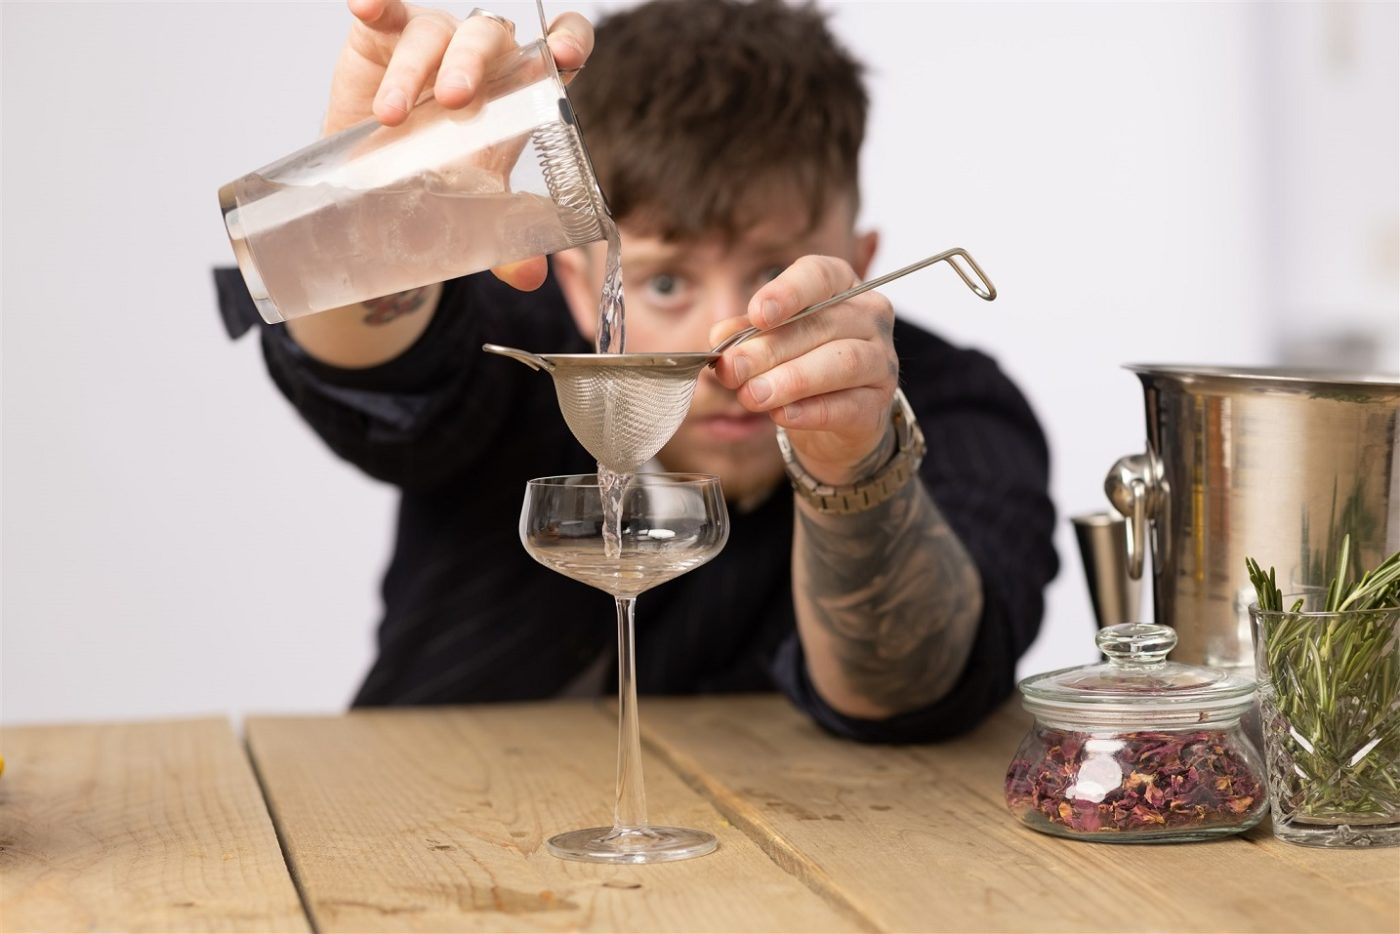 pr agency edinburgh, drinks pr, food and drink pr, news release scotland